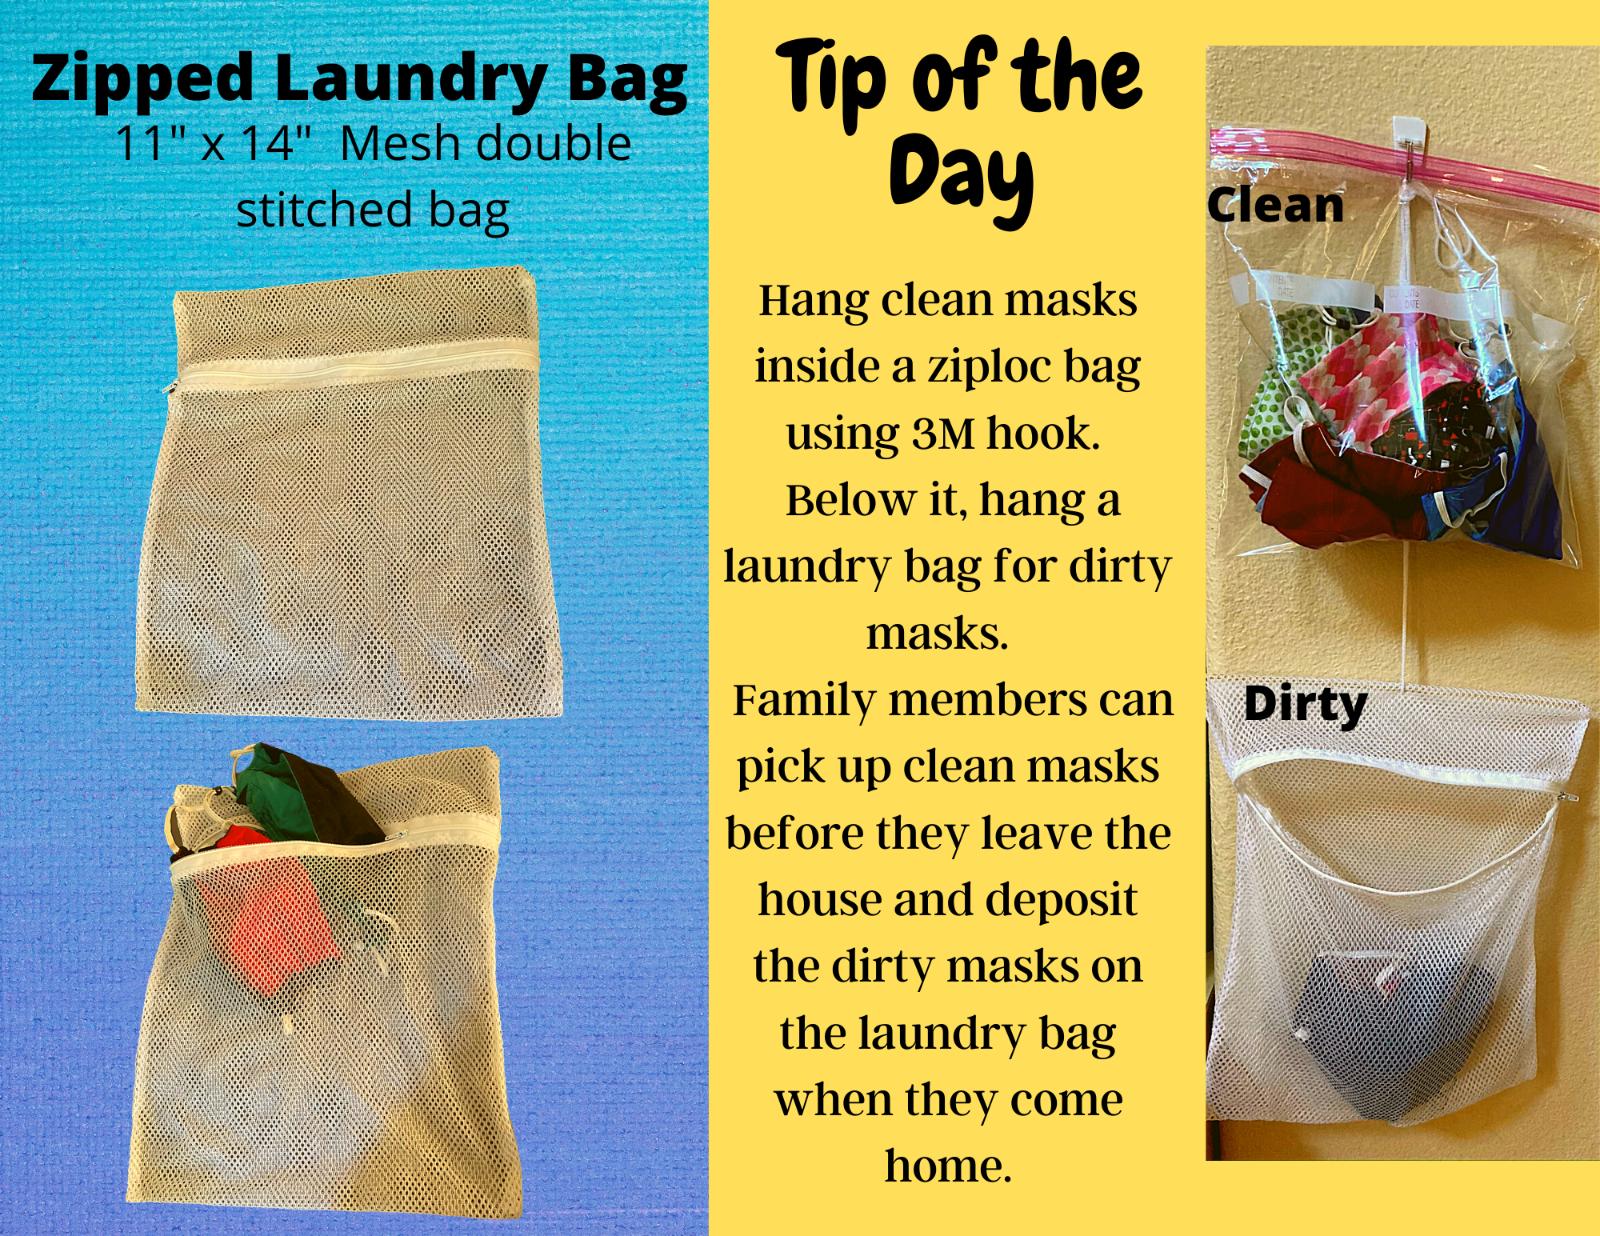 Face Mask/lingerie laundry bag